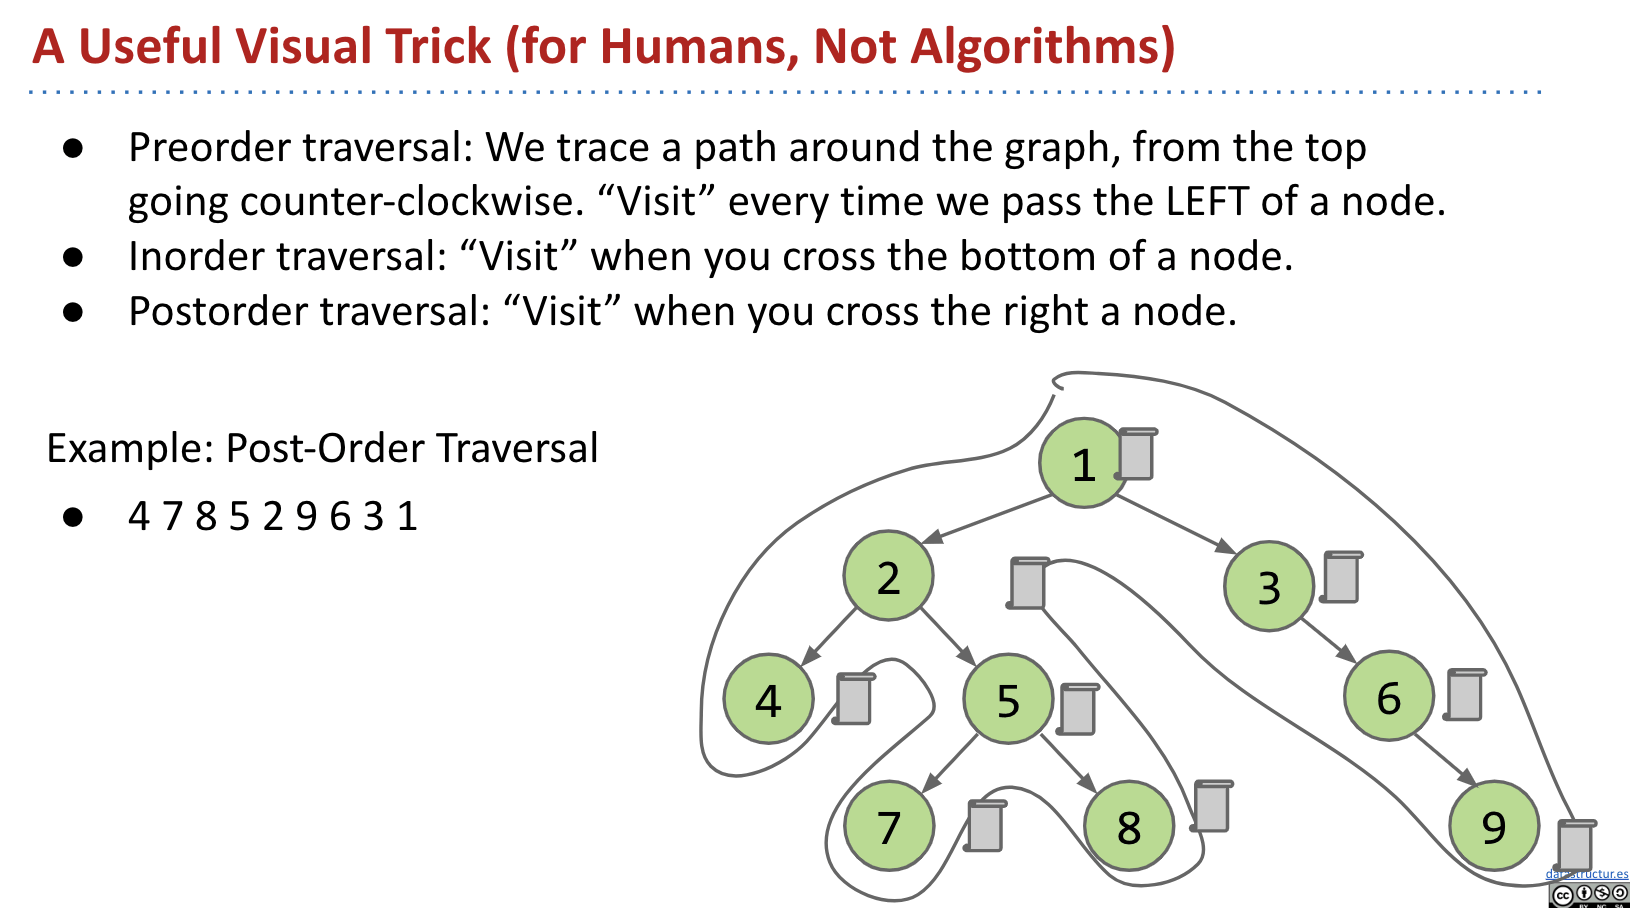 A Useful Visual Trick